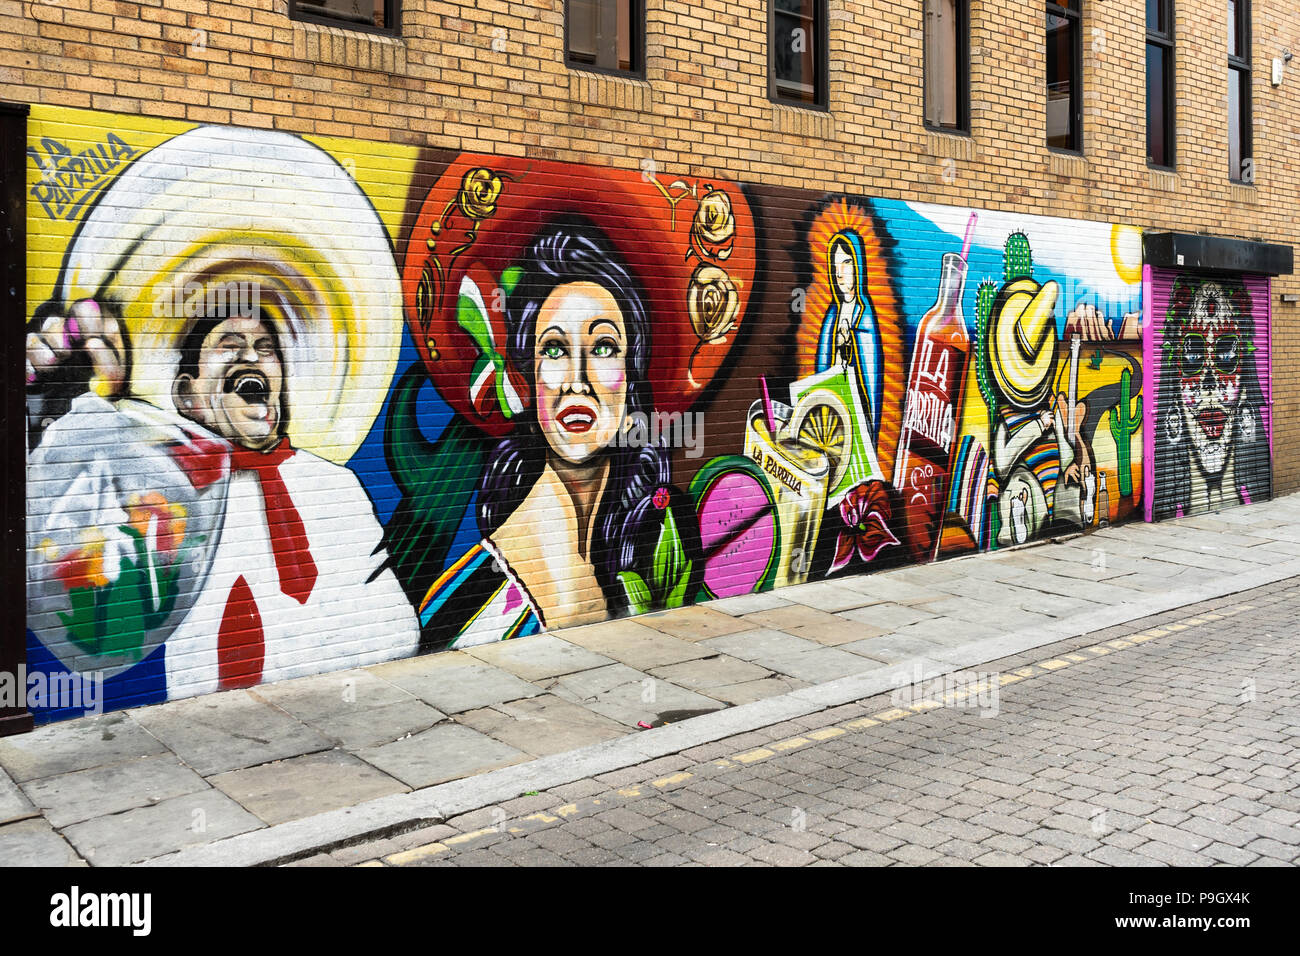 Mexican art work / graffiti on the wall, Bold Street, Liverpool, UK - Stock Image